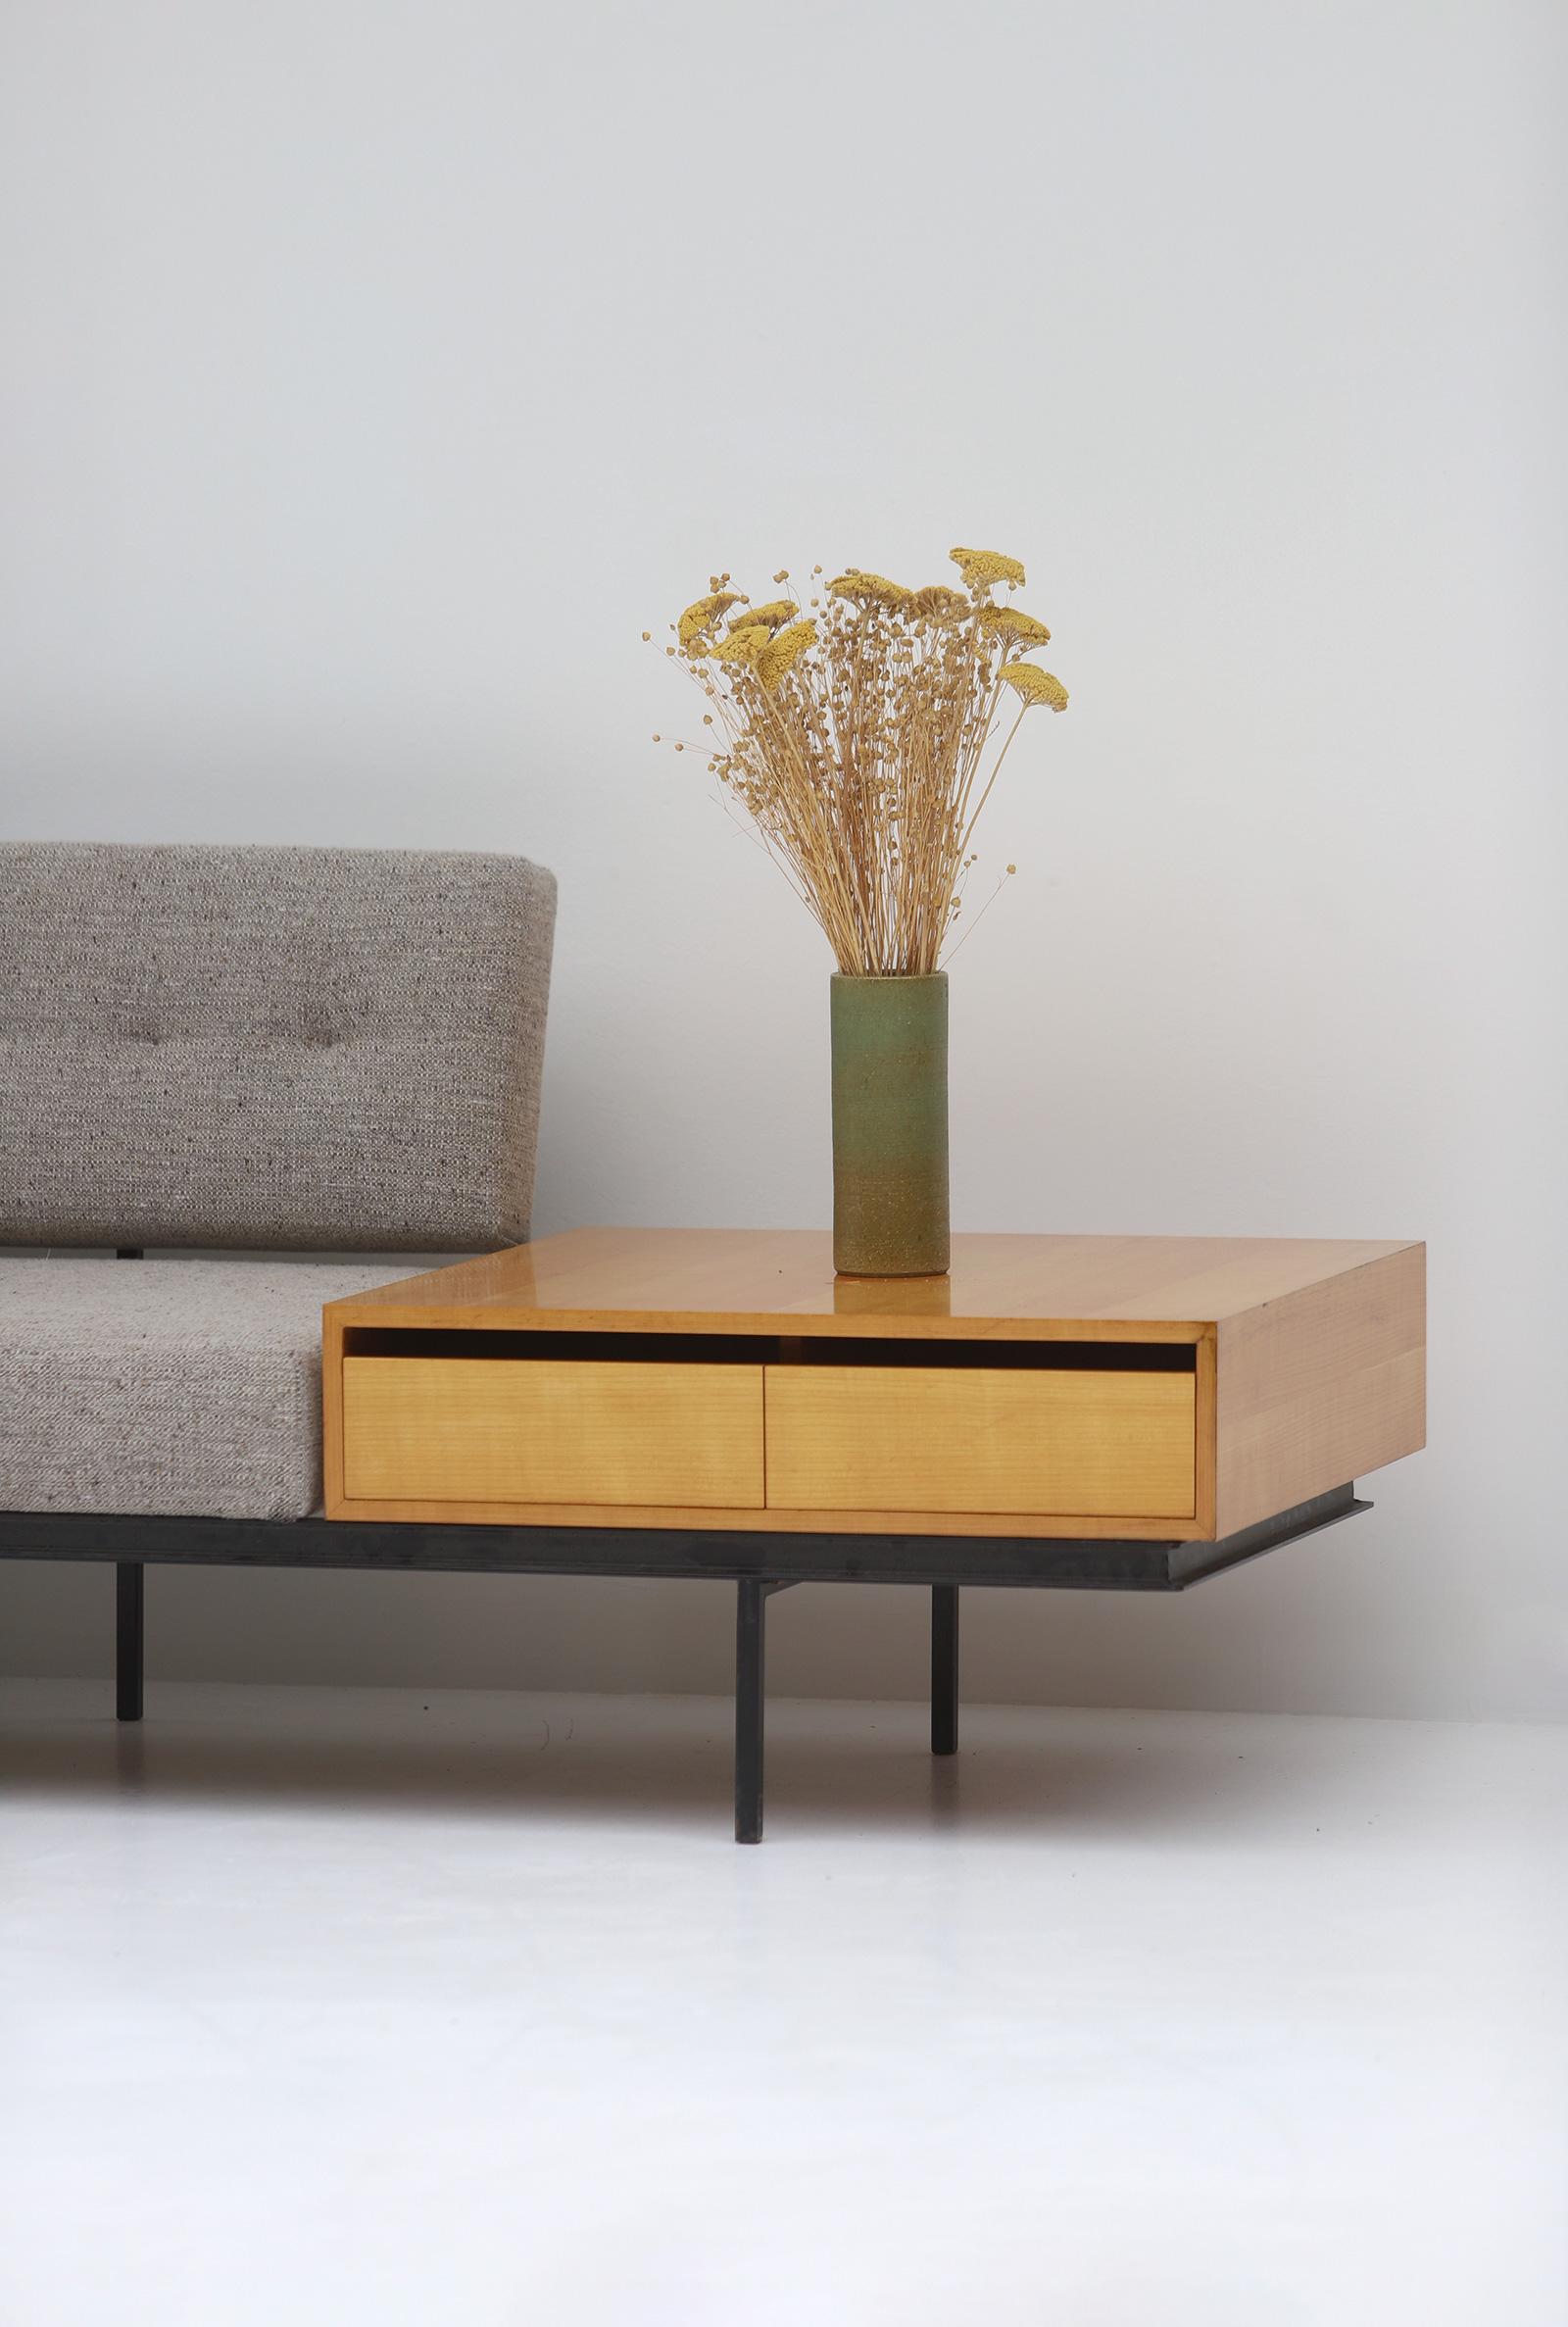 Florence Knoll Sofa & Cabinet image 4